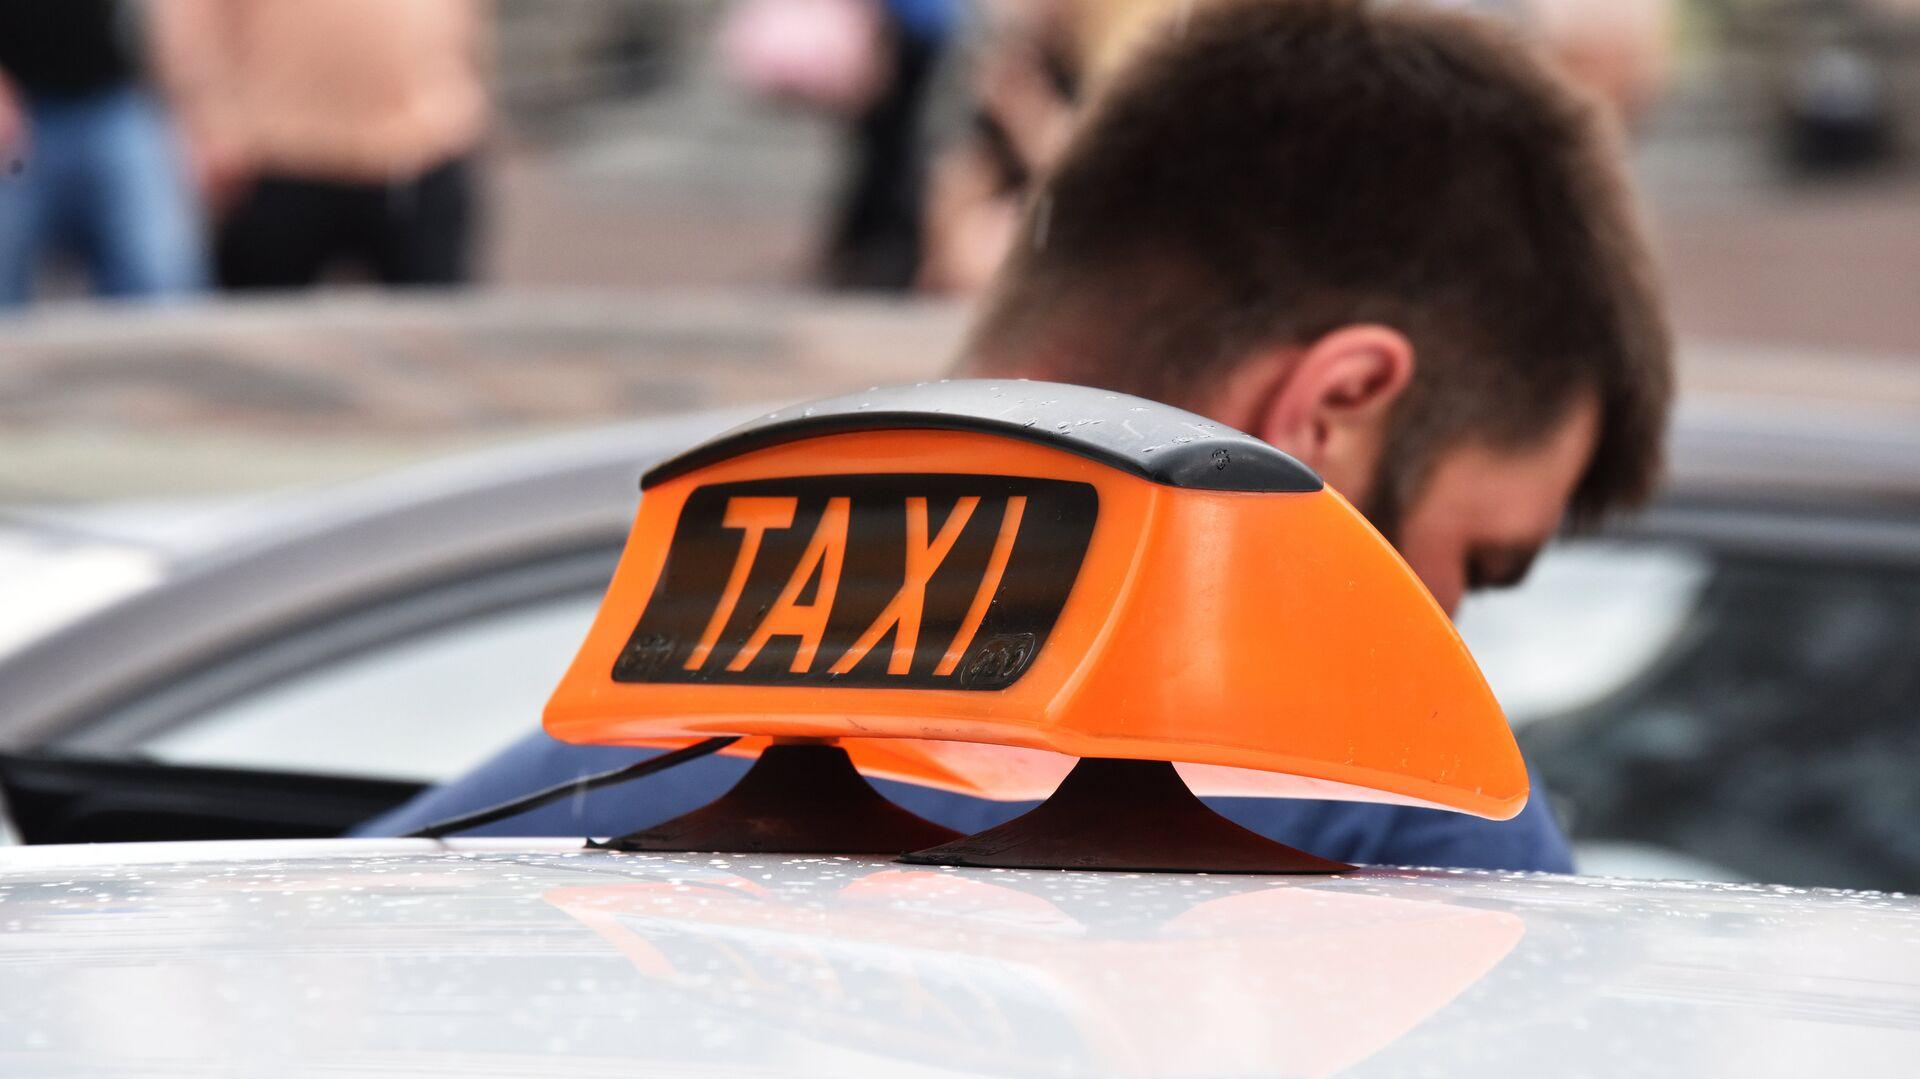 Знак такси на автомобиле - Sputnik Беларусь, 1920, 24.09.2021